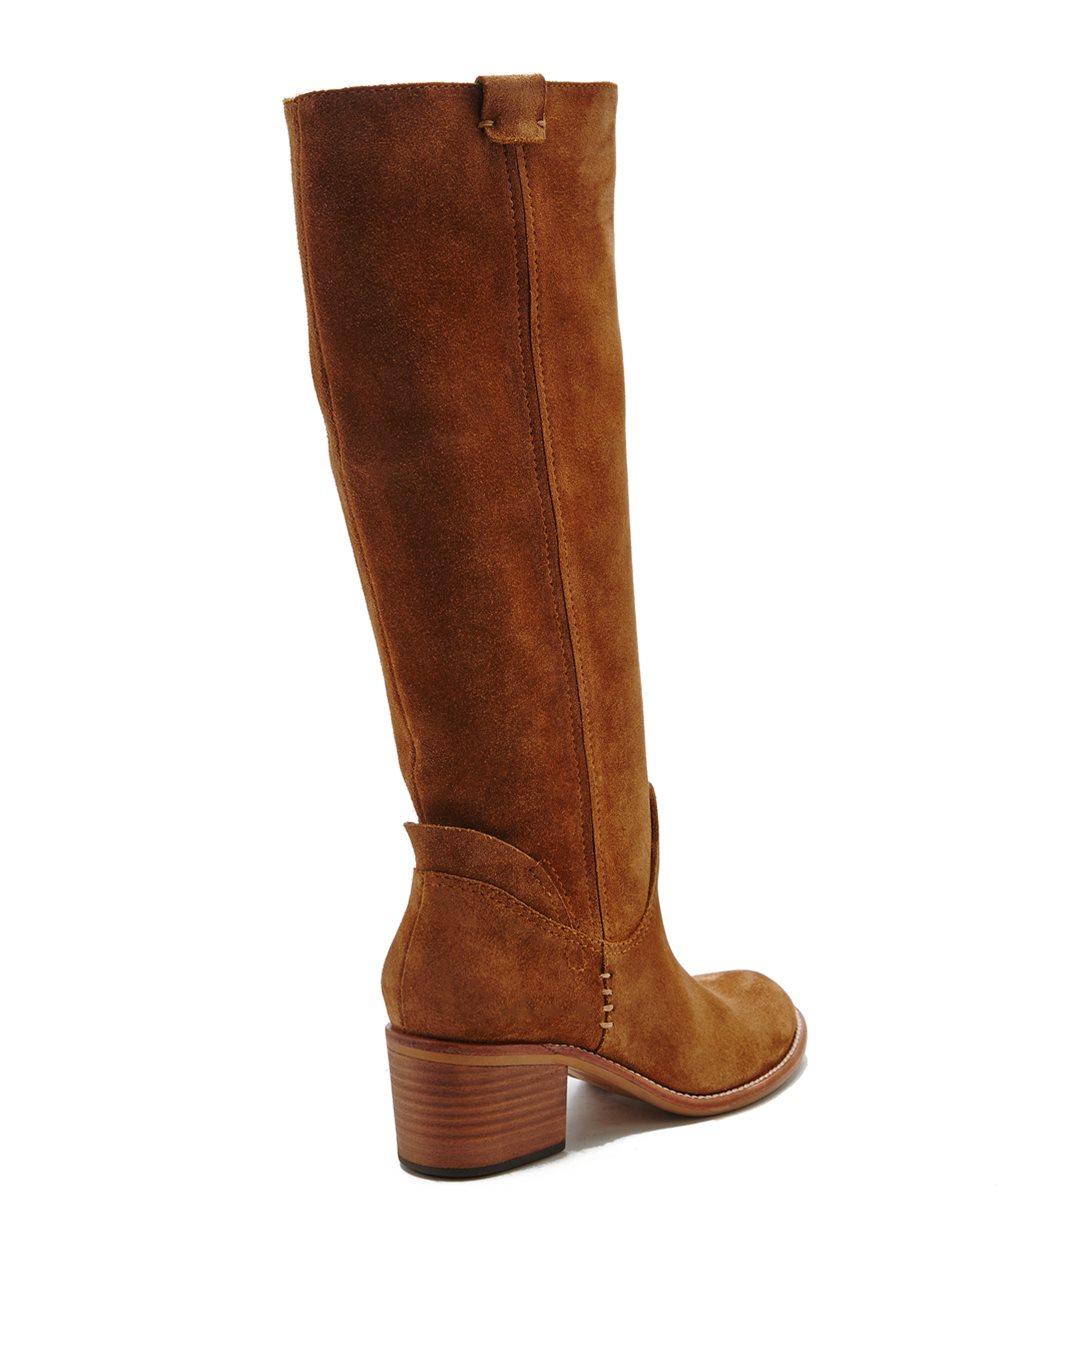 dolce vita garnett suede knee high boots in brown saddle